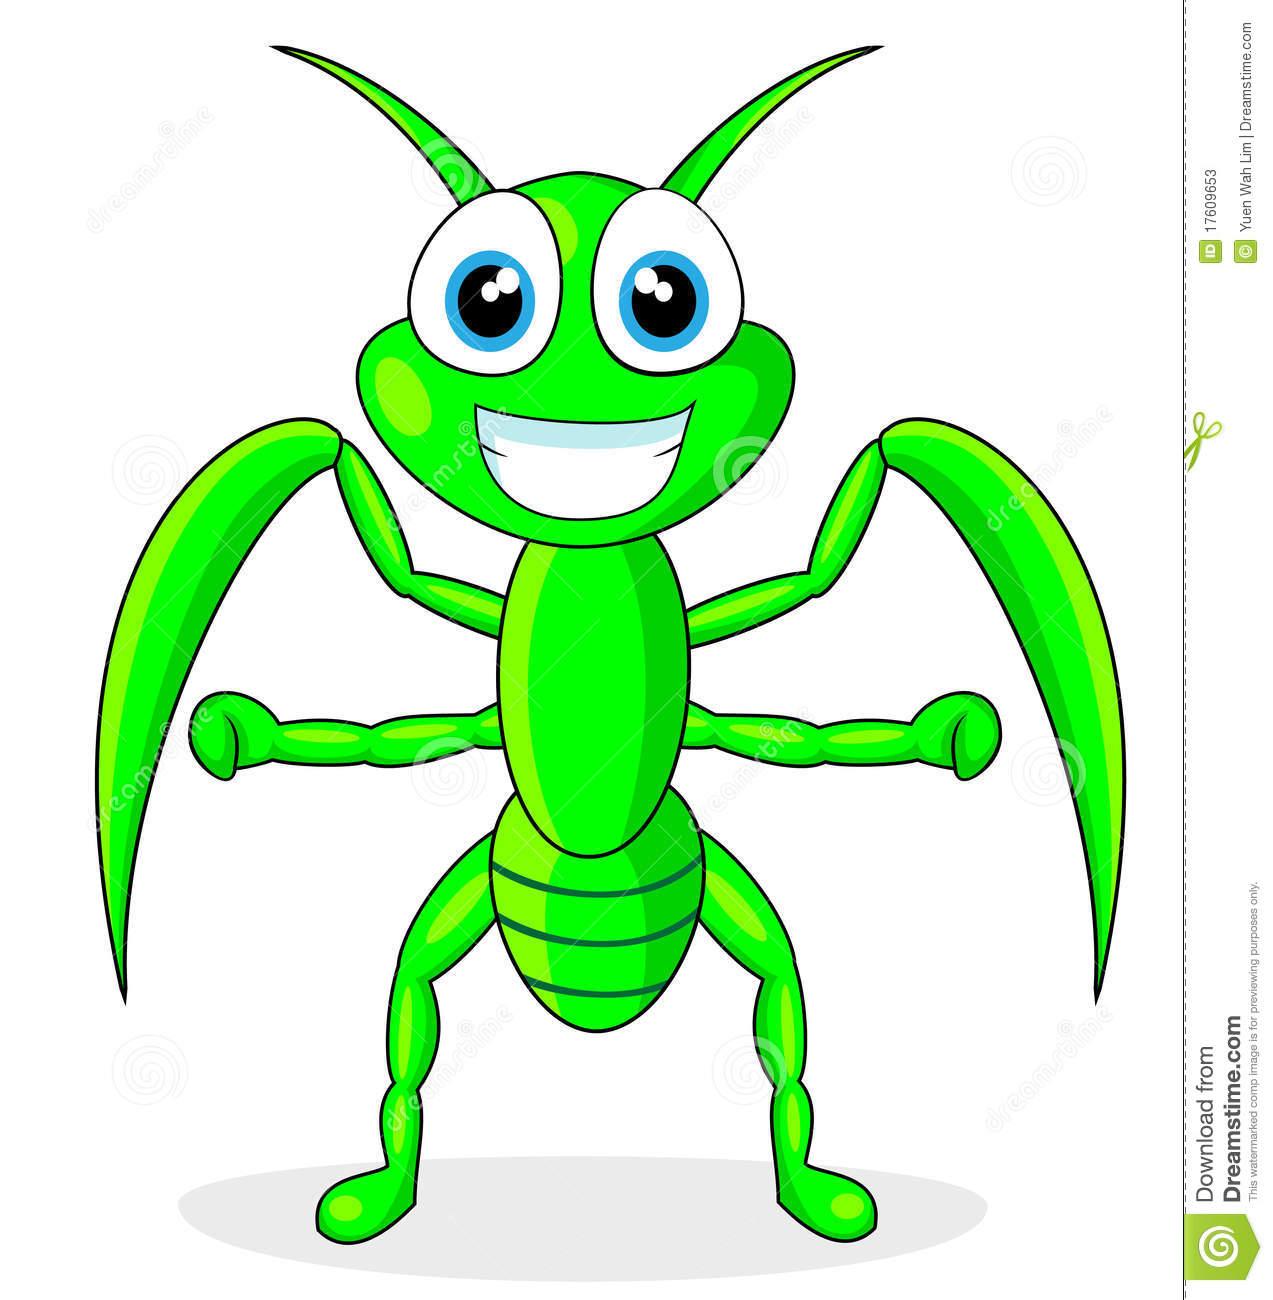 Mantis clipart Praying #102 clip art art